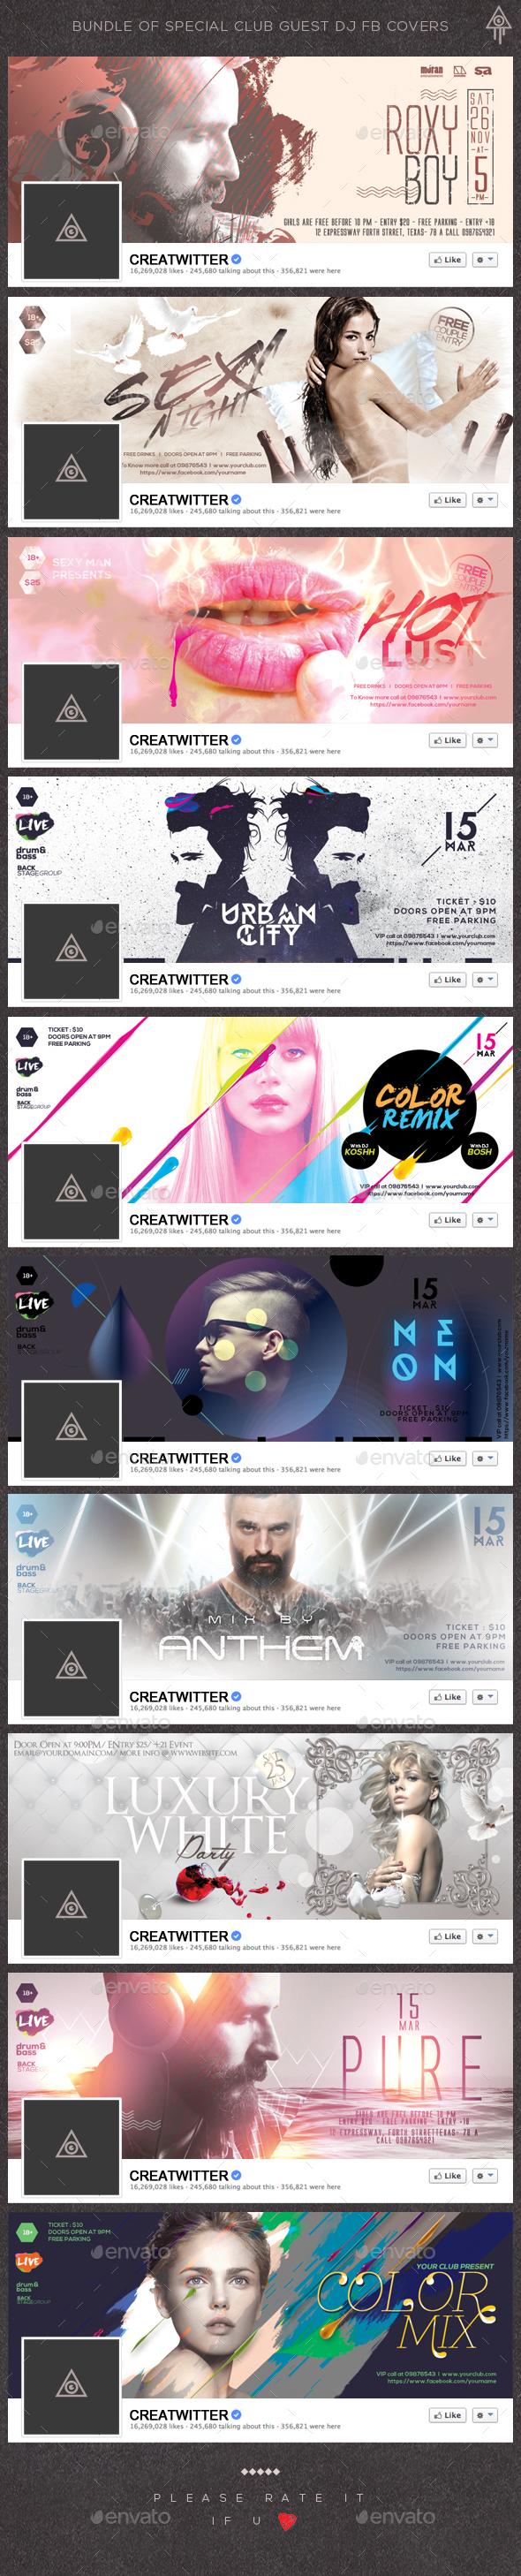 Bundle of Special Club Guest DJ Facebook Covers - Facebook Timeline Covers Social Media